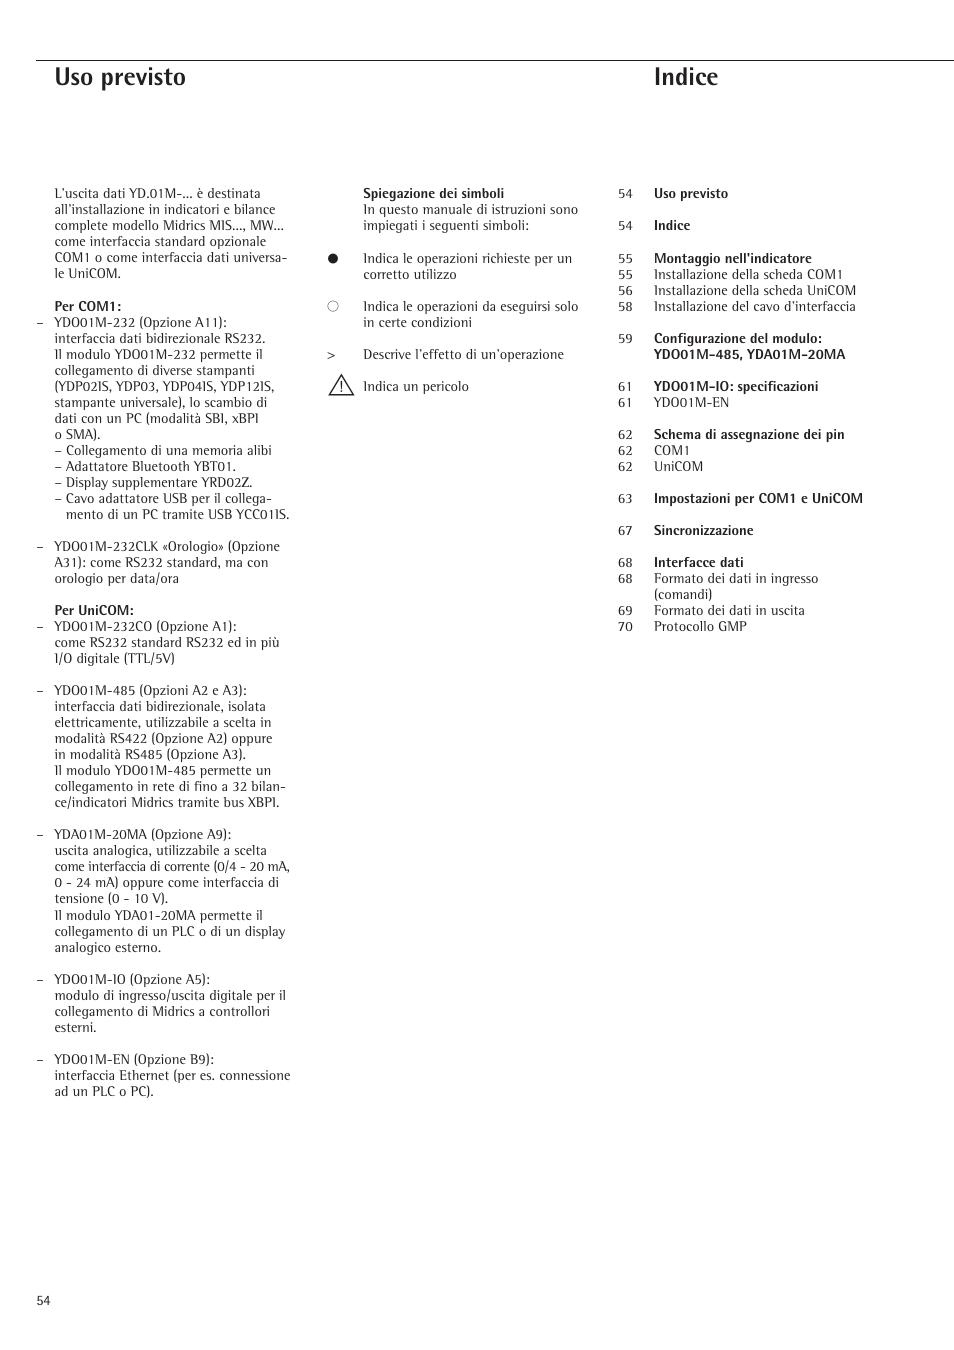 Manual de balanza sartorius eaebmodels. Pdf | weighing scale.